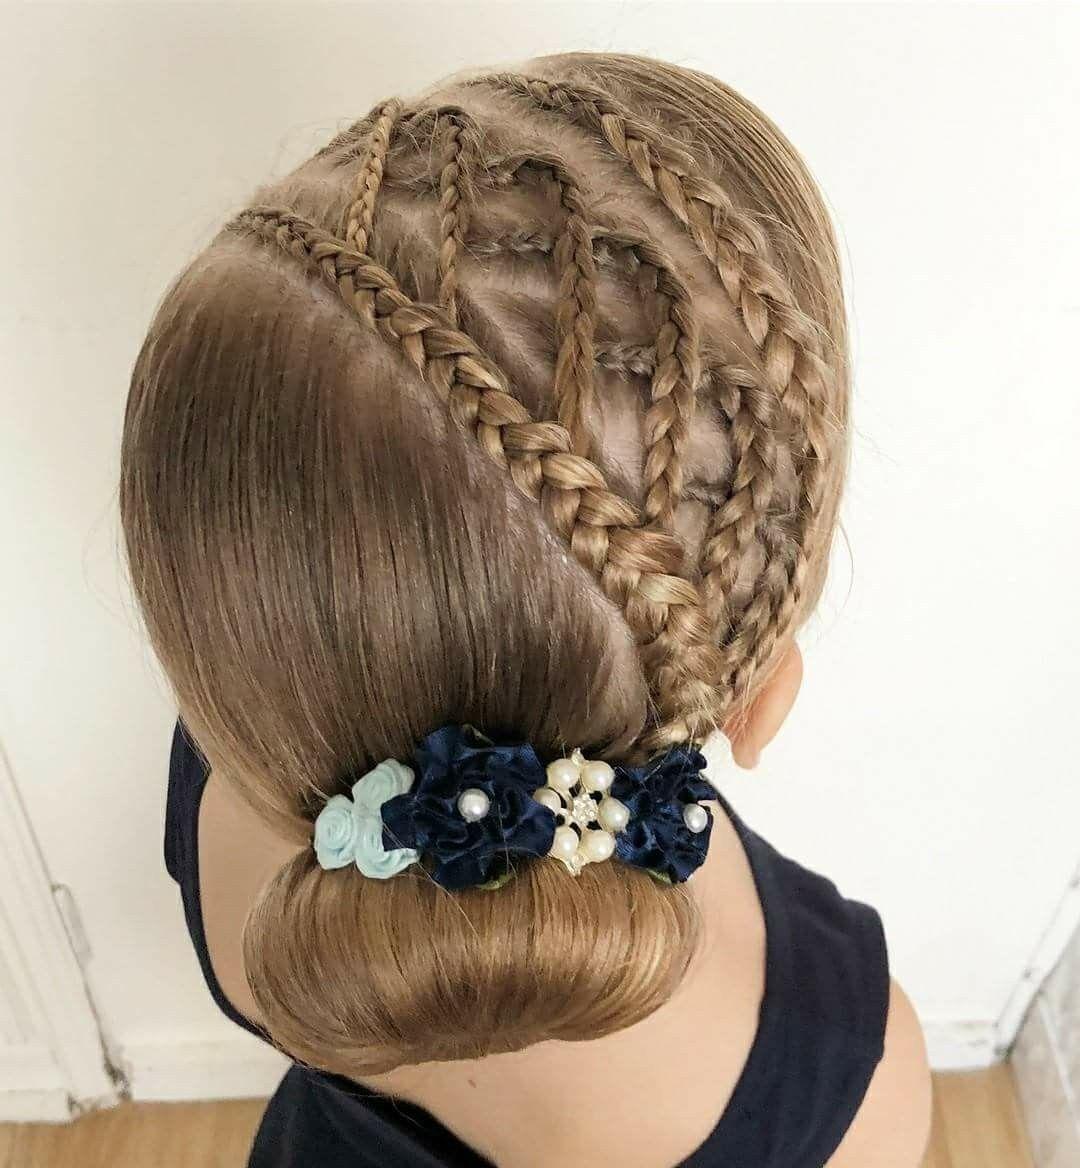 Pin De Katy Seneyda En Peinados De Nina Peinados Infantiles Peinados Nina Trenzas Peinados